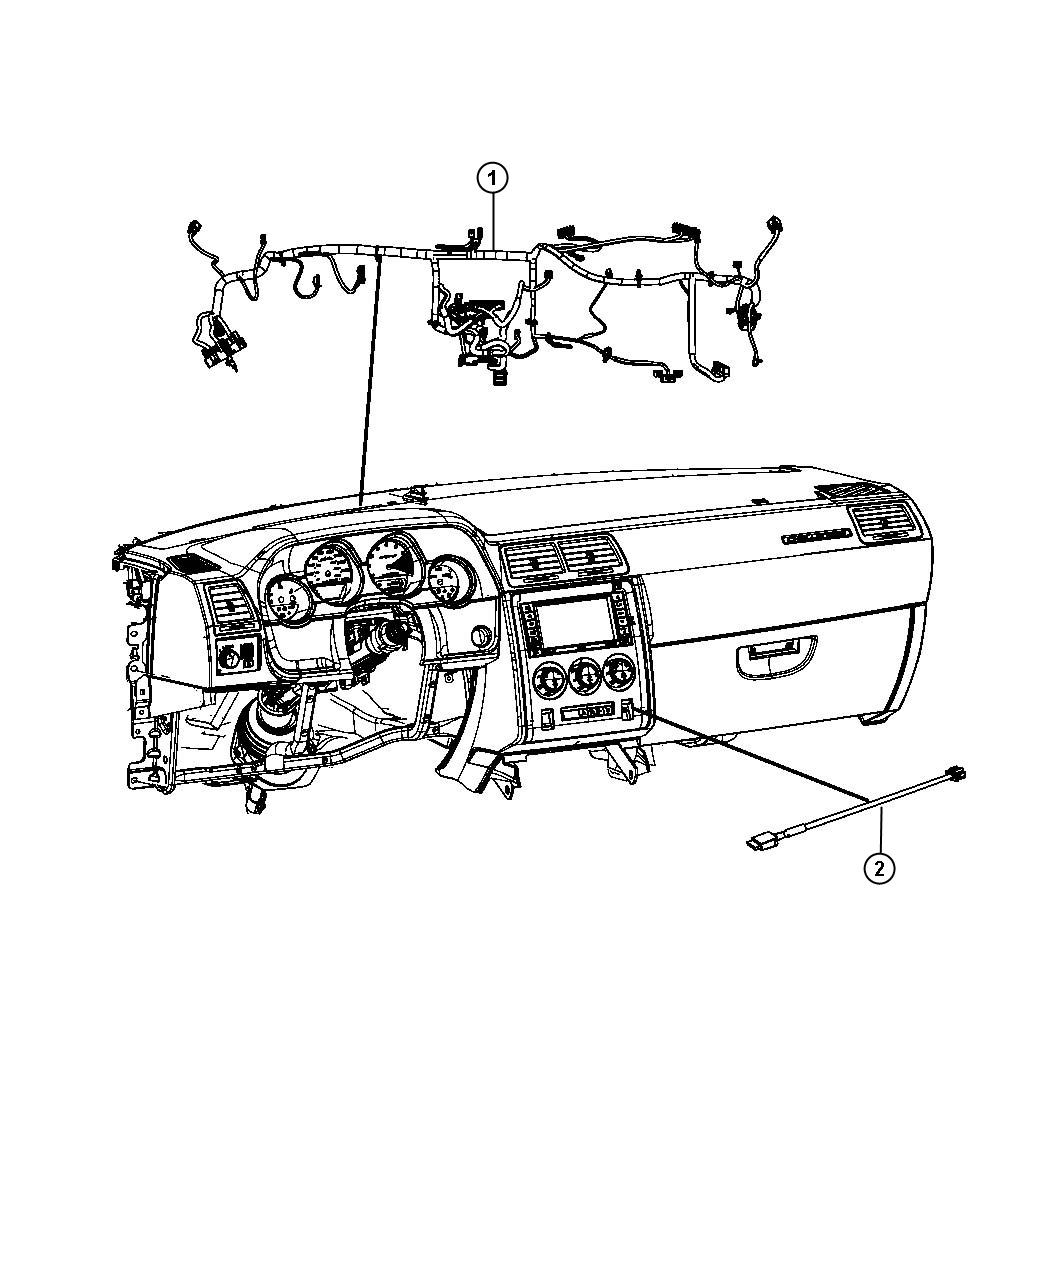 2013 Dodge Challenger Wiring. Instrument panel. Command